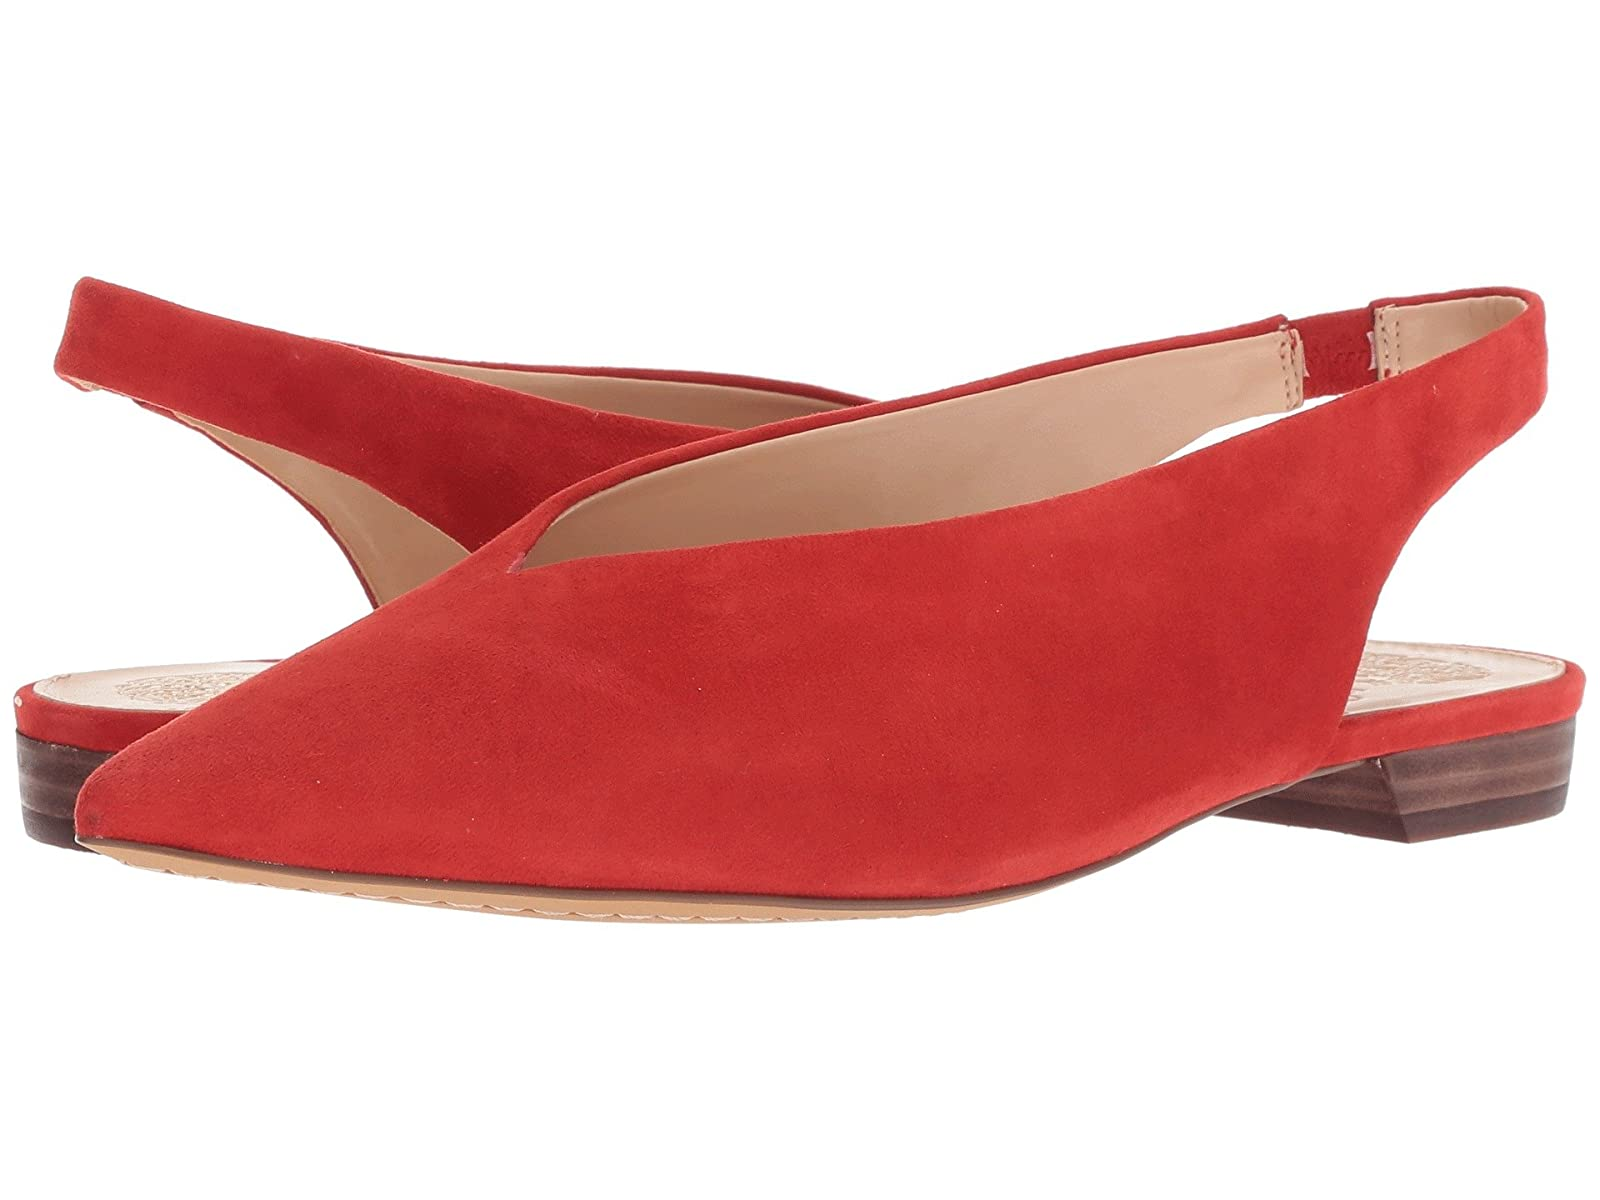 Vince Camuto MaltidaAtmospheric grades have affordable shoes